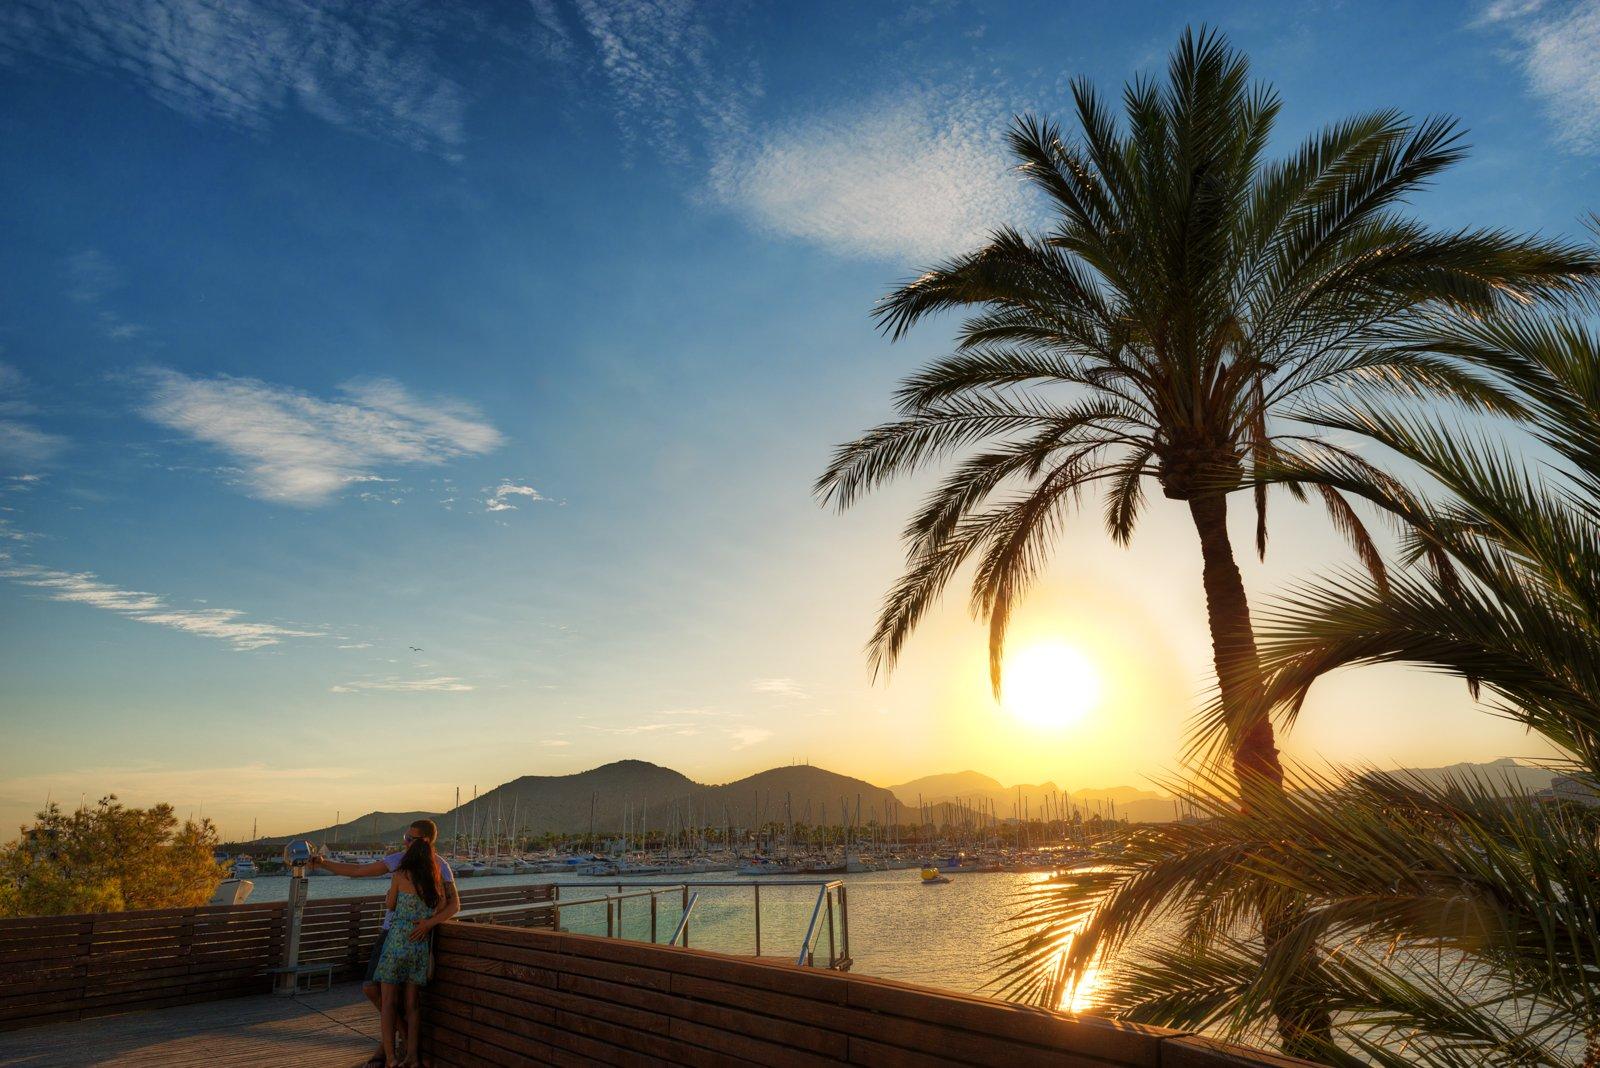 Romantisches Pärchen beim Urlaub in Alcudia, Mallorca